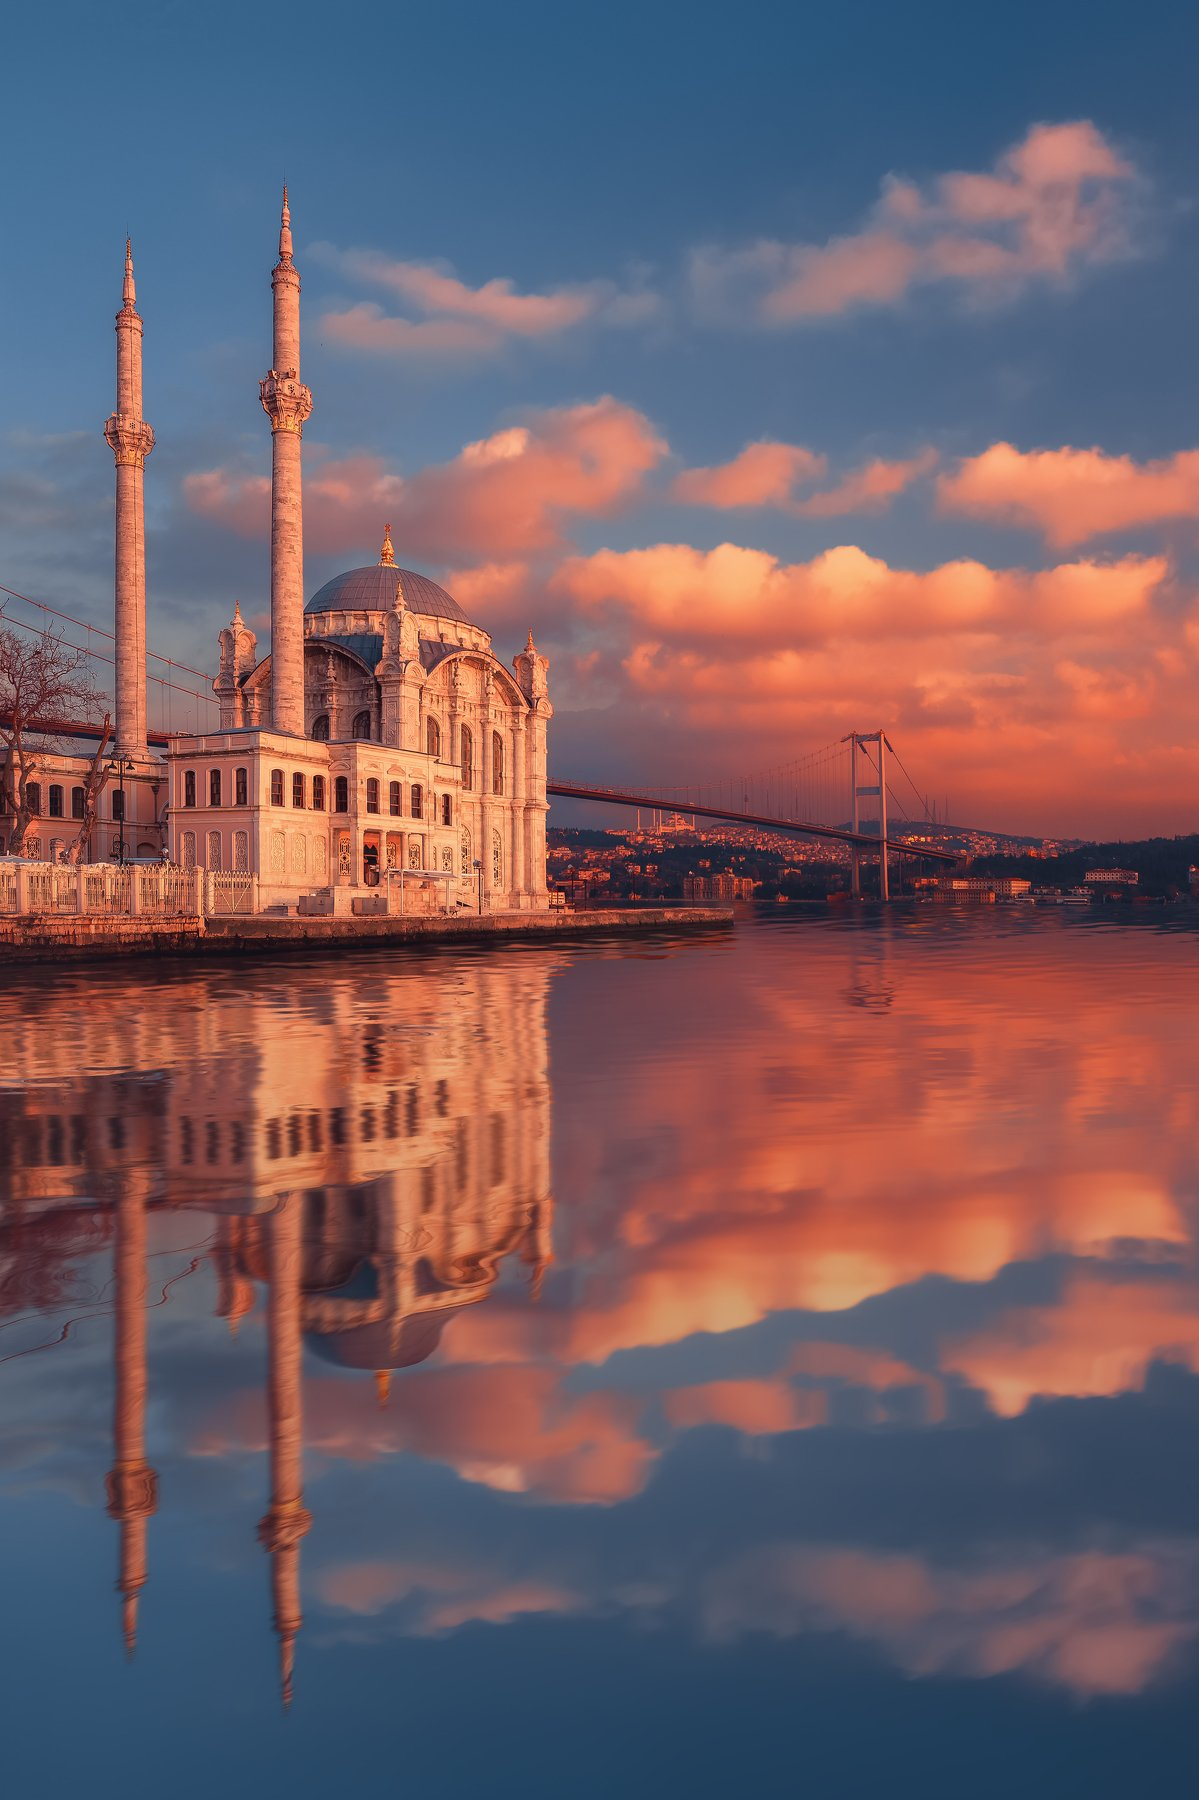 ortakoy mosque, istanbul,  mosque, reflection, sunset, water, вода, закат, мечеть, стамбул, турция,, Мазурева Анастасия